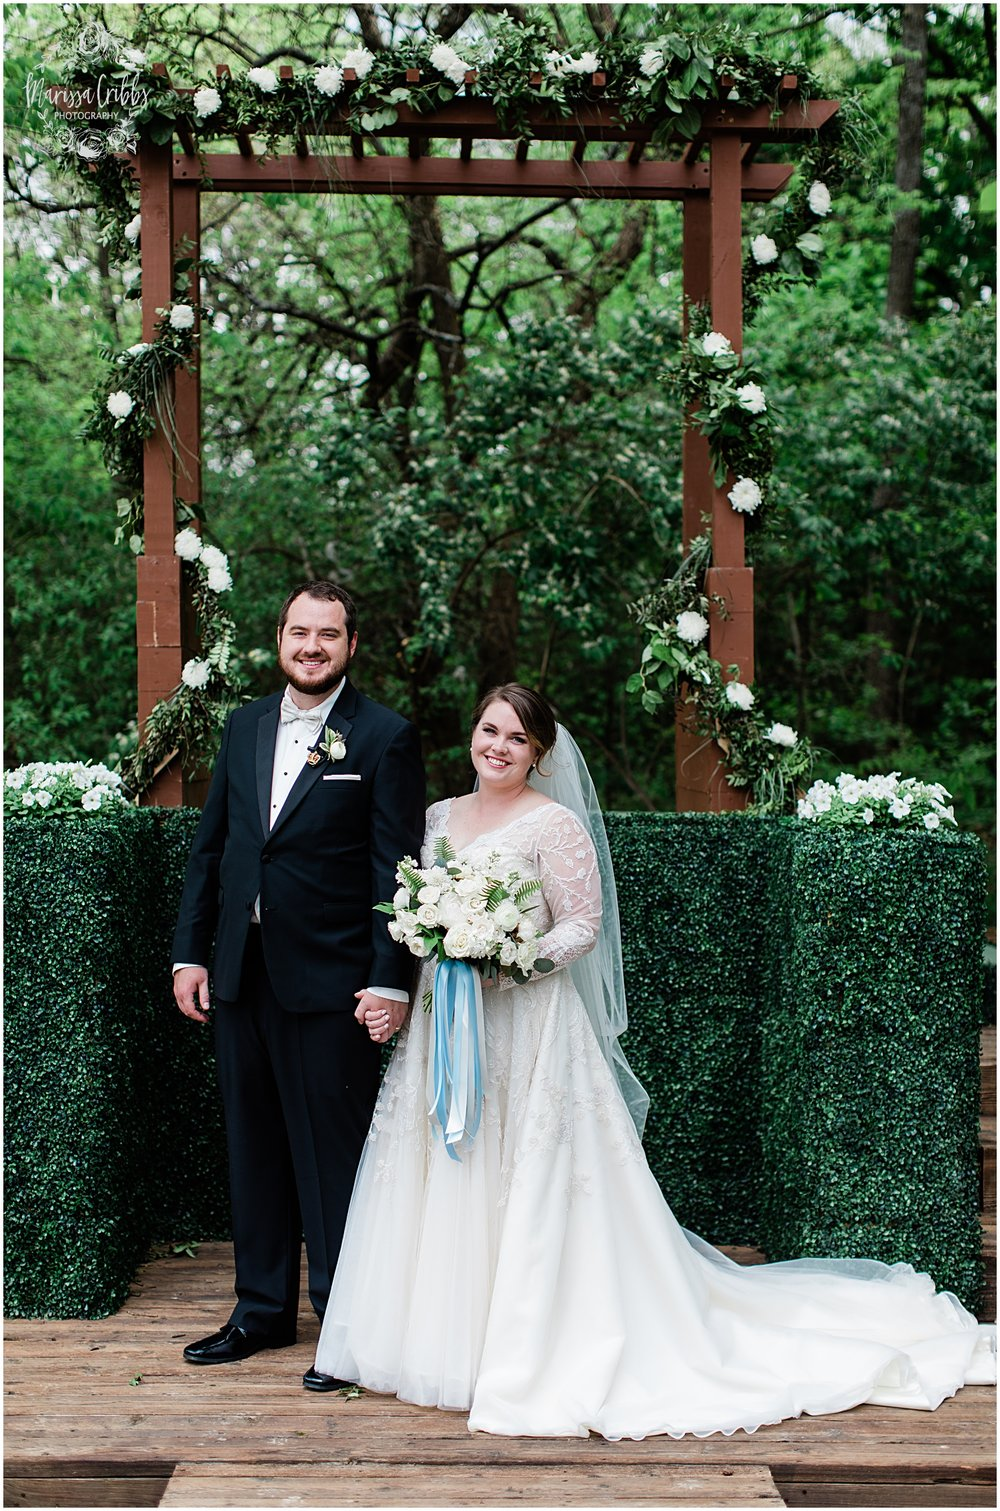 GORBY WEDDING | MARISSA CRIBBS PHOTOGRAPHY_5017.jpg